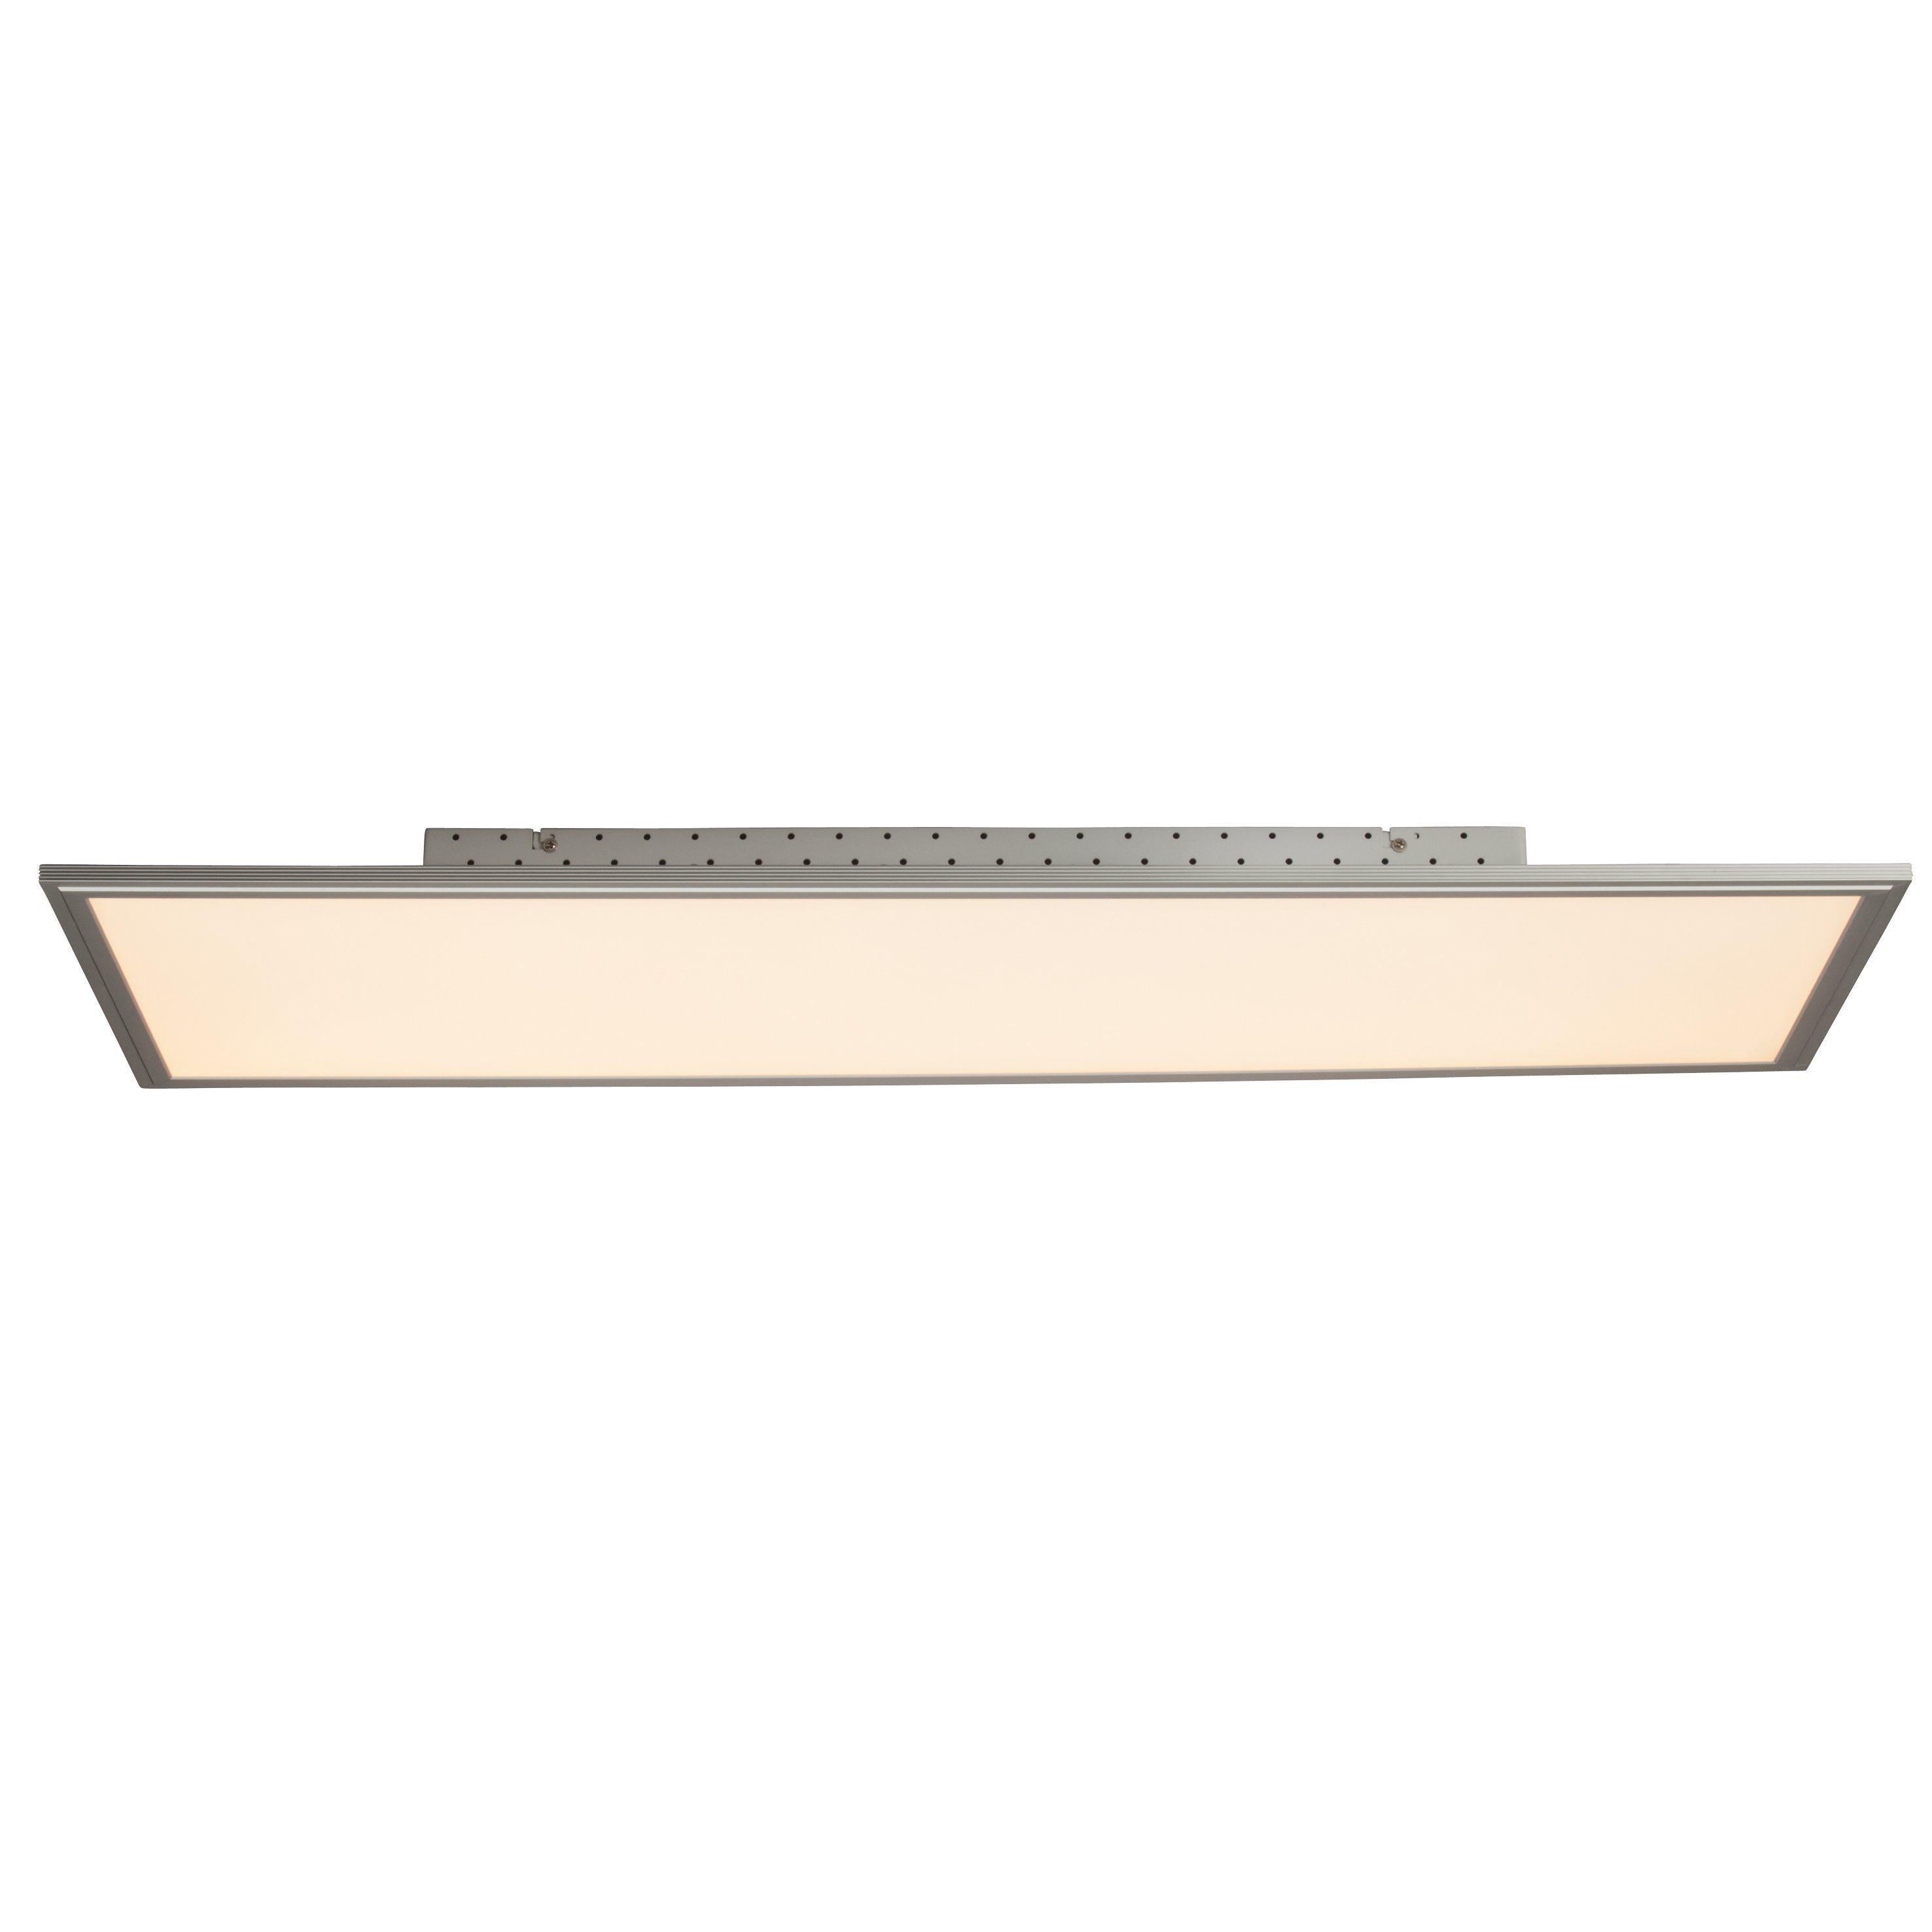 Brilliant Leuchten Flat LED Deckenaufbau-Paneel 100x35cm alu/weiß